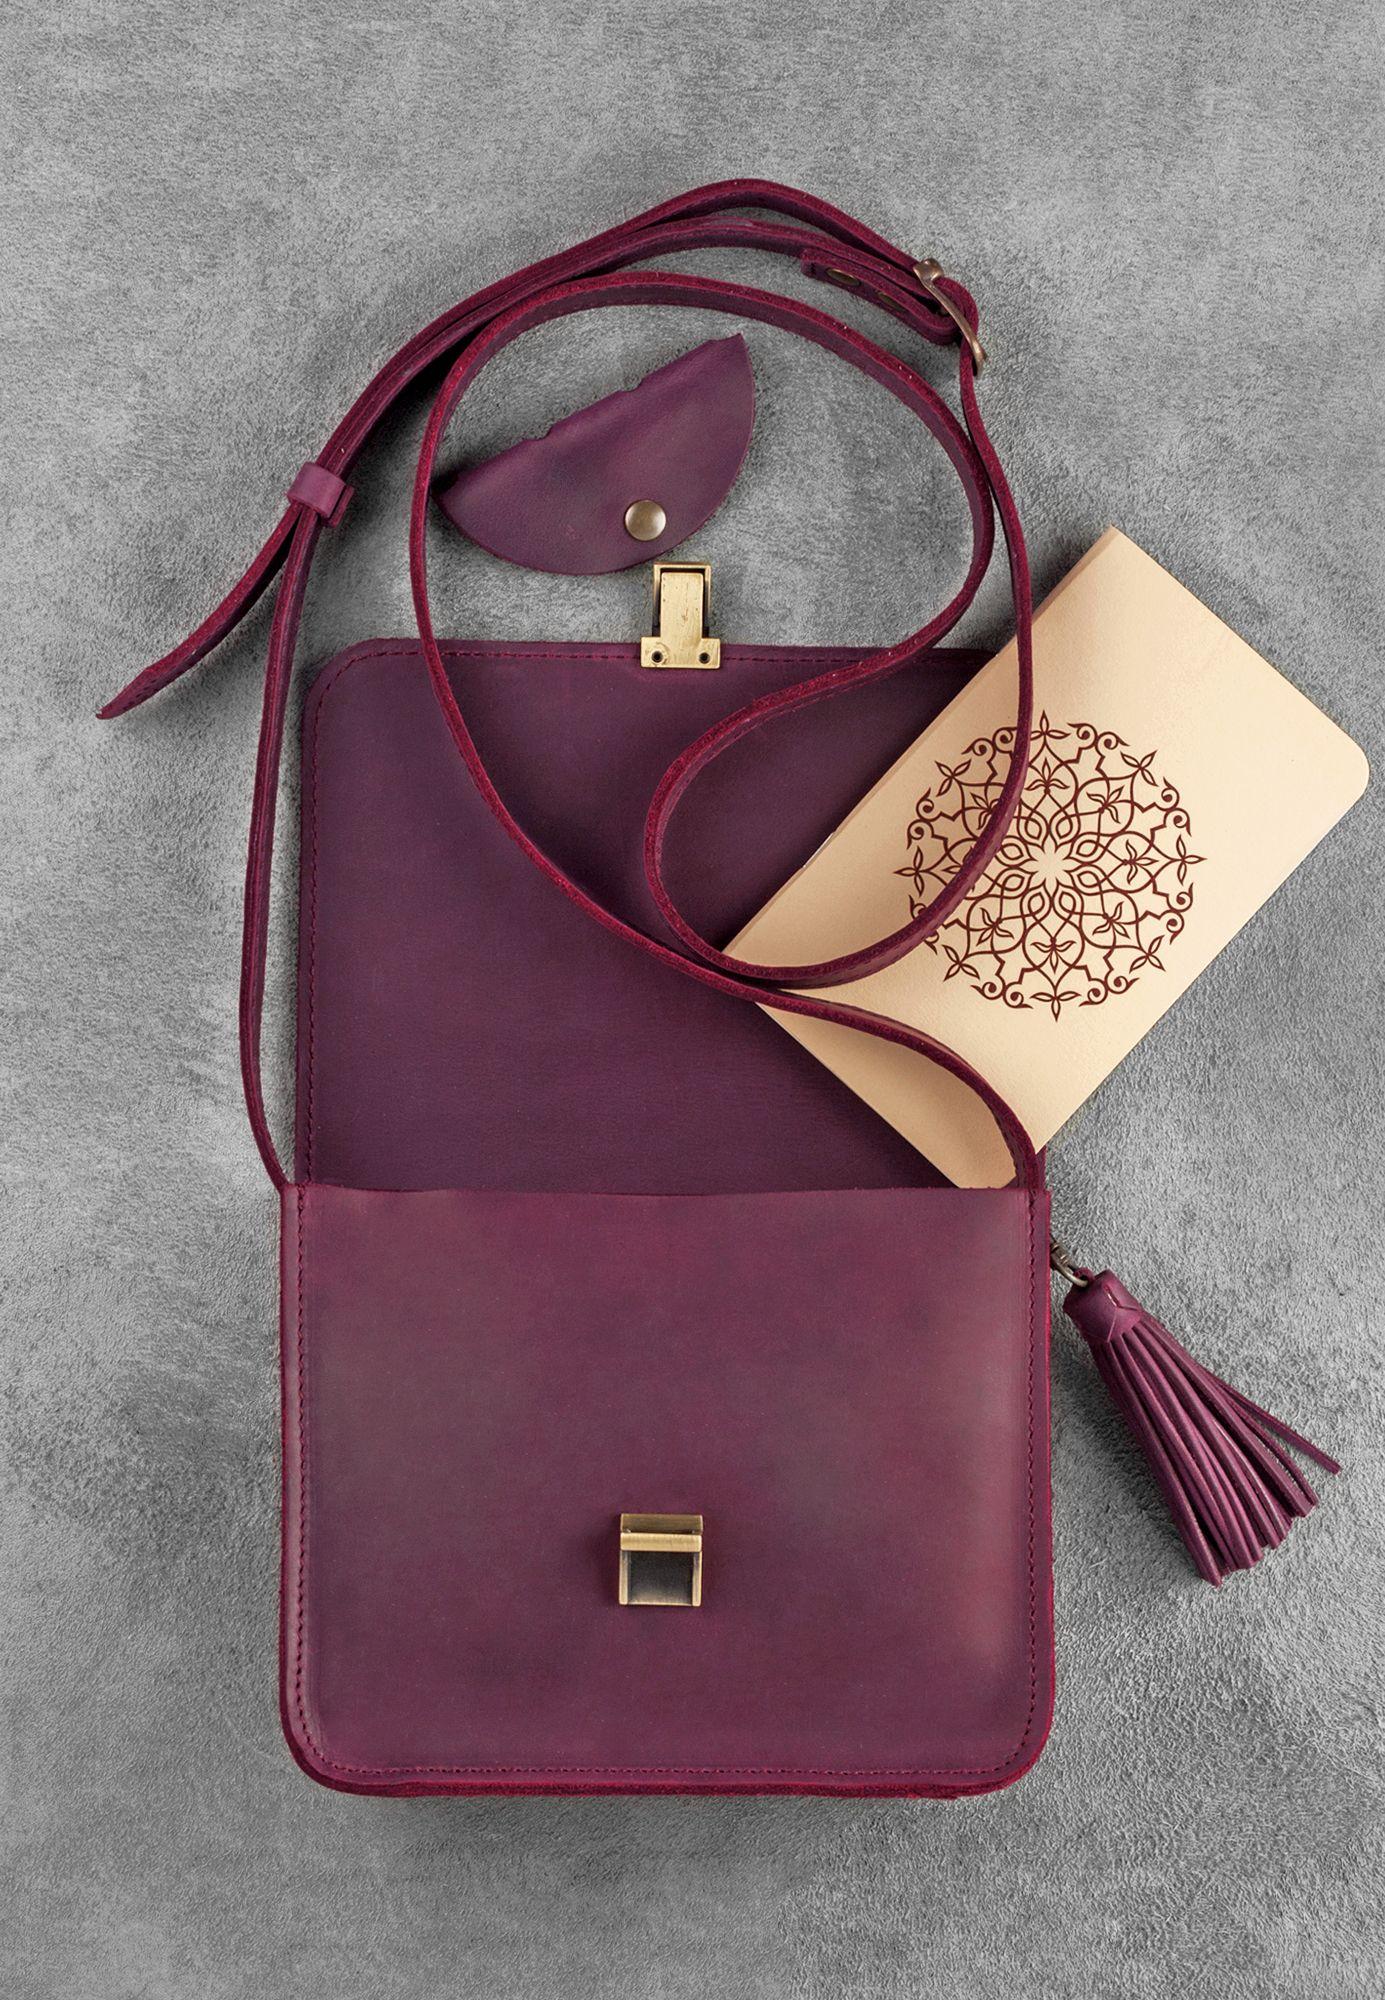 Кожаная сумка бохо Лилу Виноград Фото 3